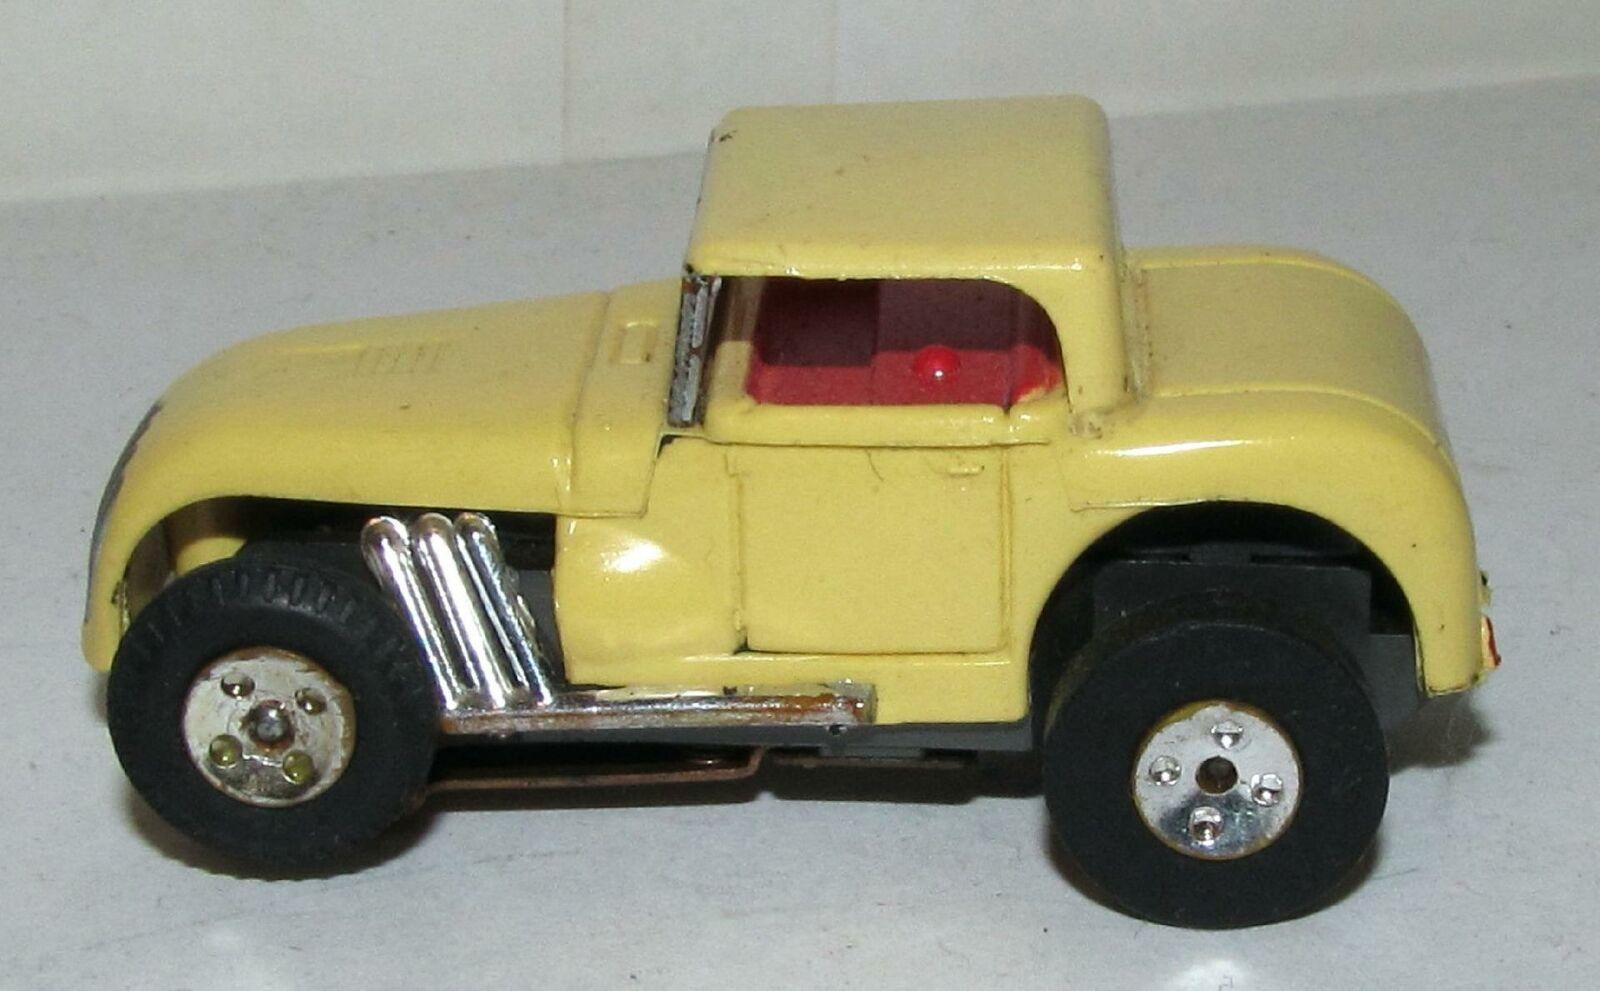 Aurora Tjet Hot Rod Coupe Ho ranura de de coche, amarillo con Interior Rojo  1366  hasta un 50% de descuento